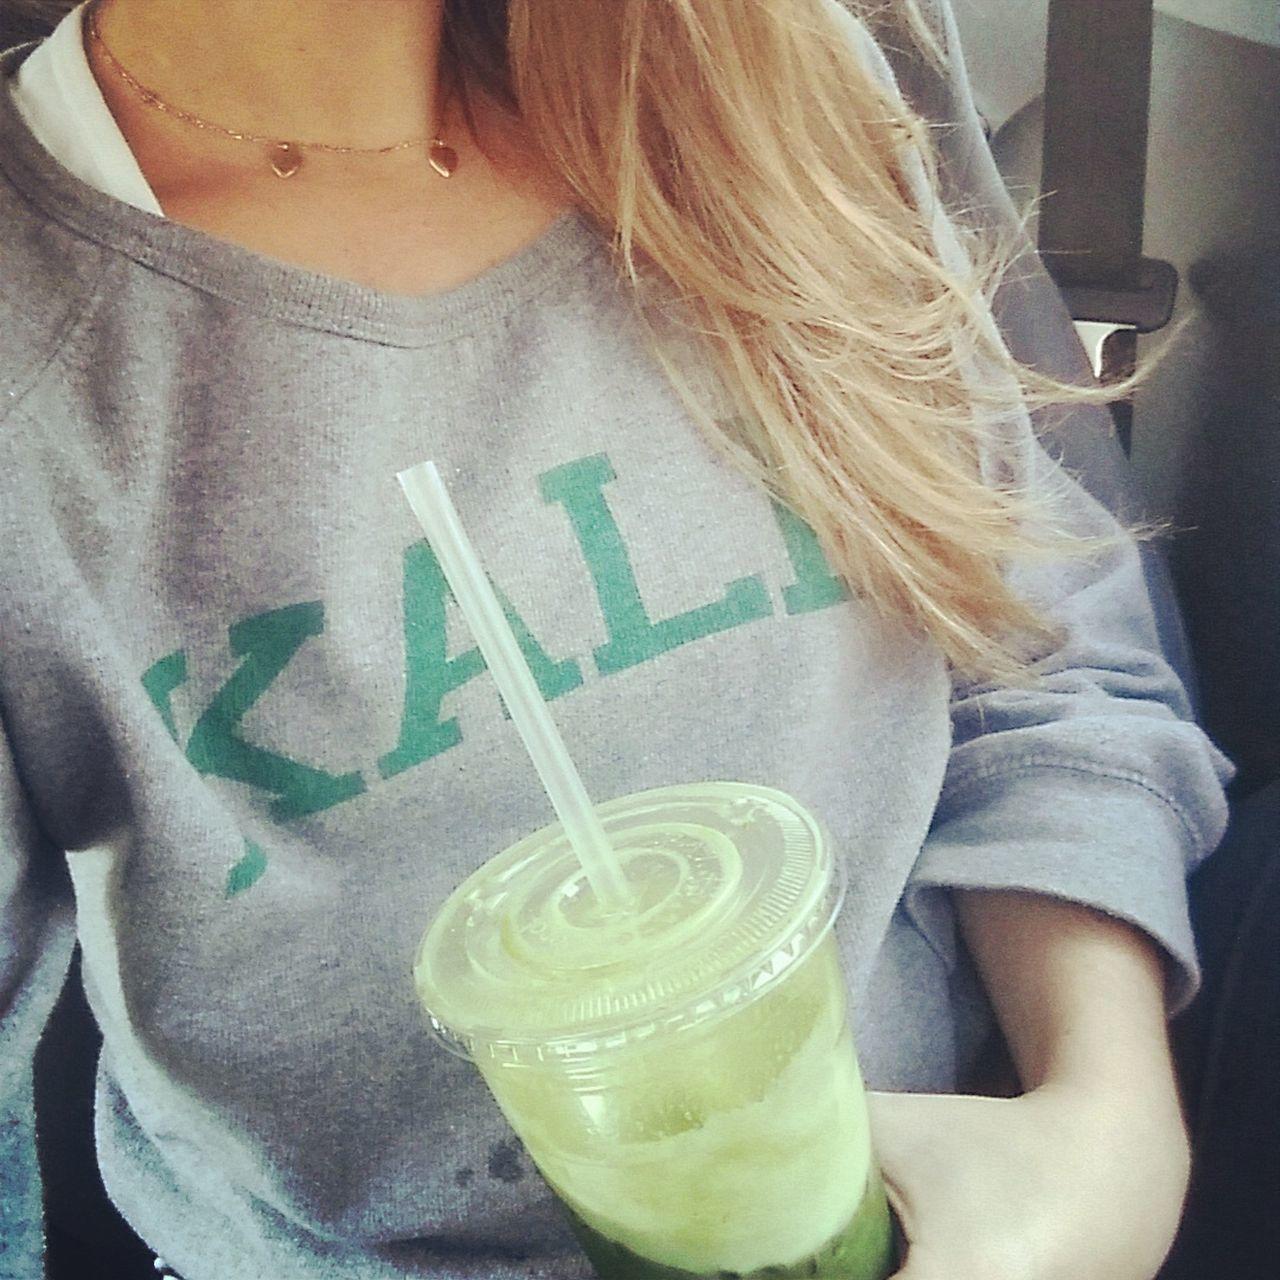 Kale Green Green Juice Fit Fitness Selfie Vegan Soclicheithurts Basic